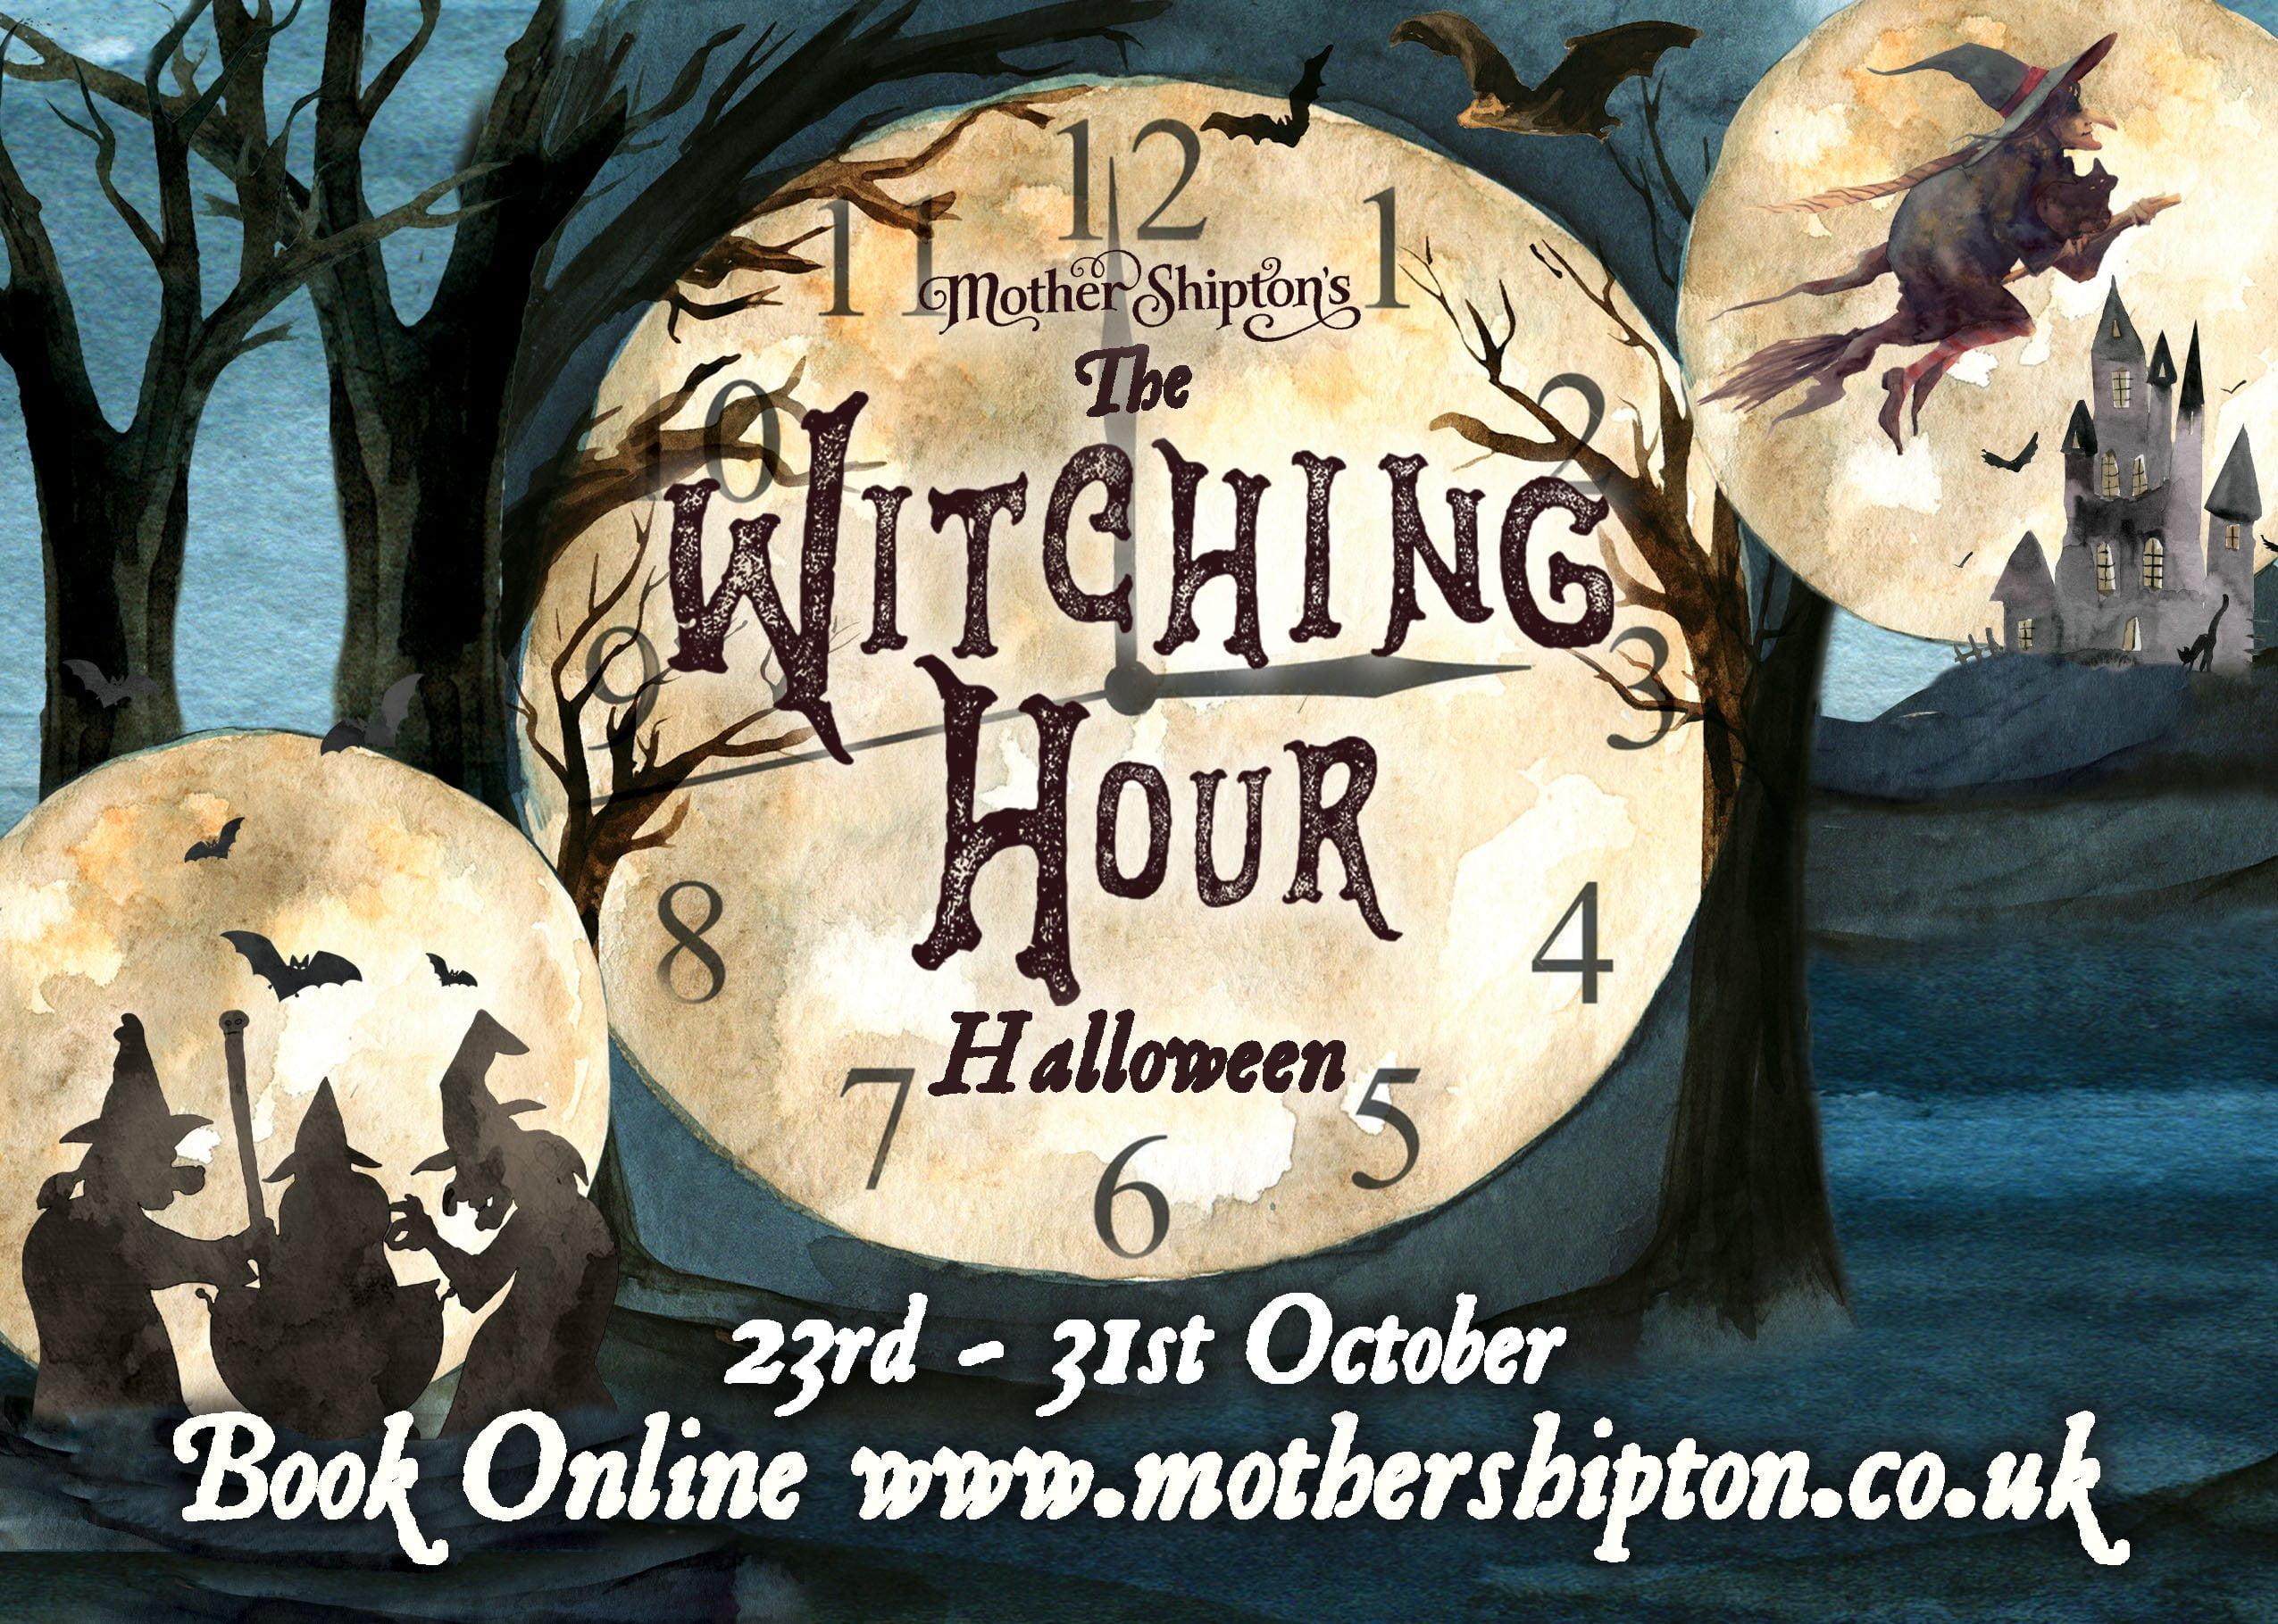 Halloween at Mother Shipton's 4